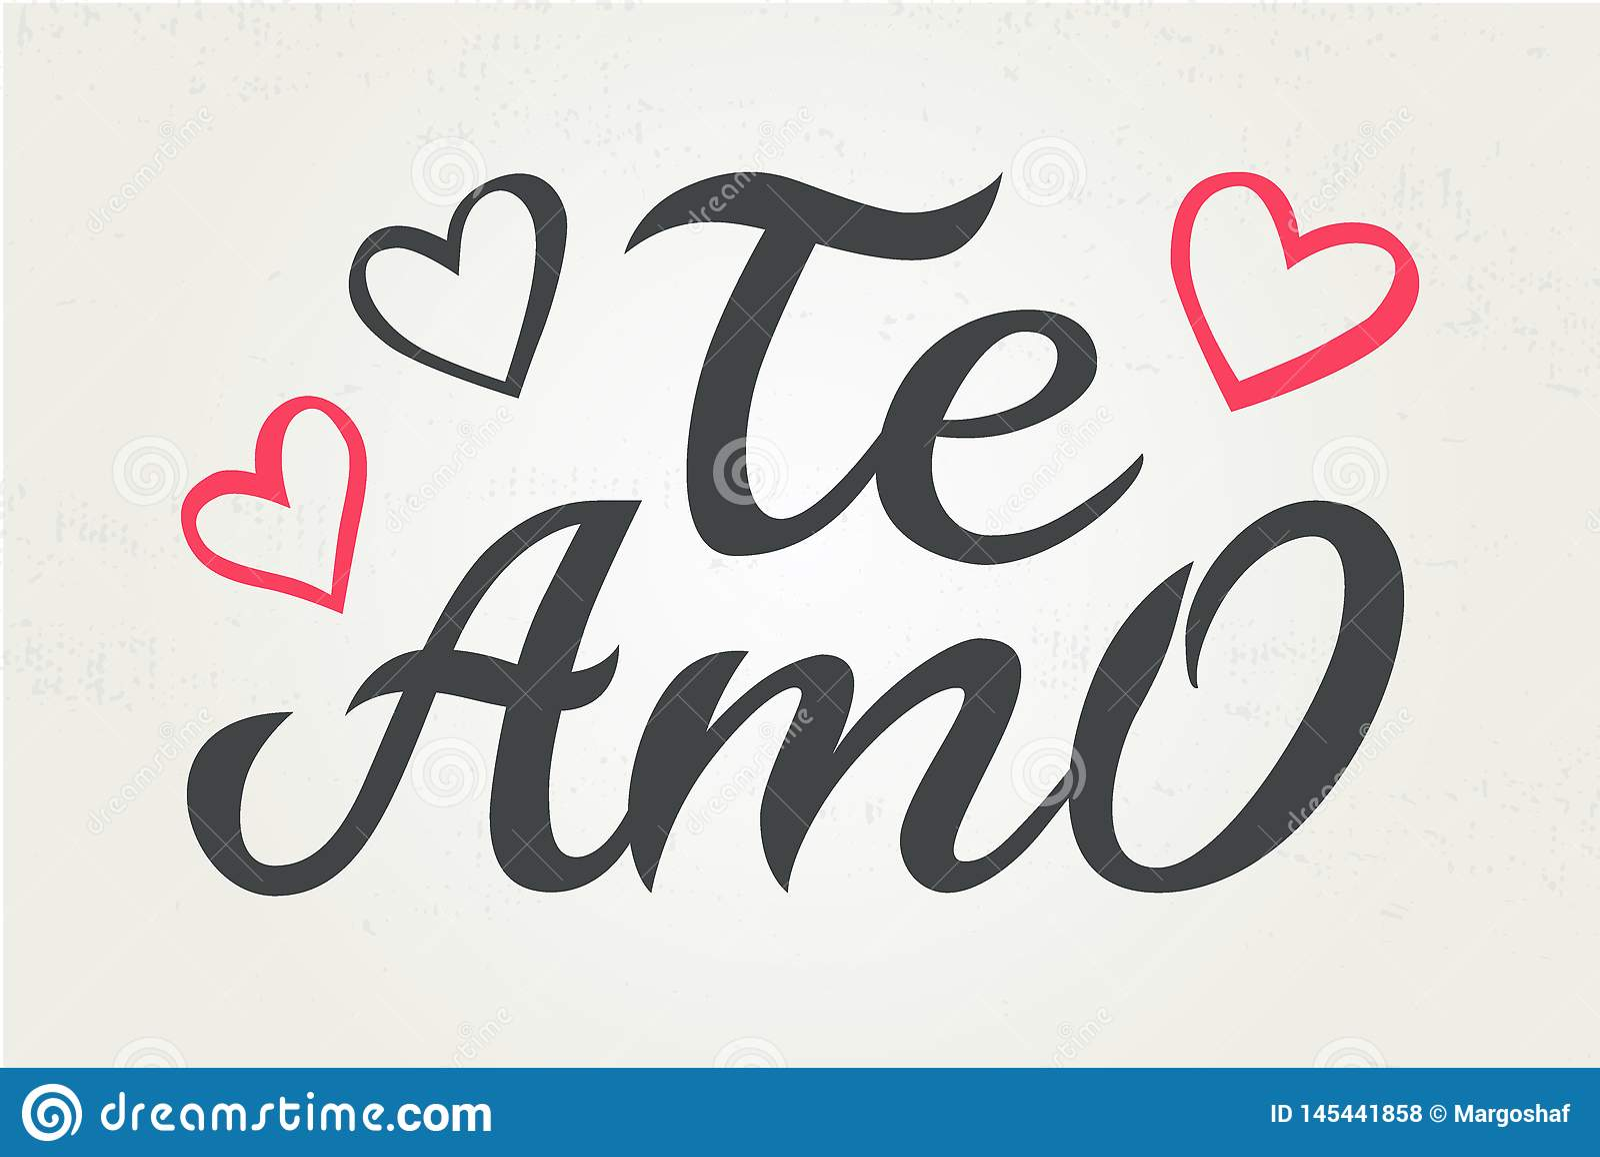 Hand drawn typography lettering Te amo. Te amo - I love you in Spanish, romantic decorative lettering. Vector Valentine